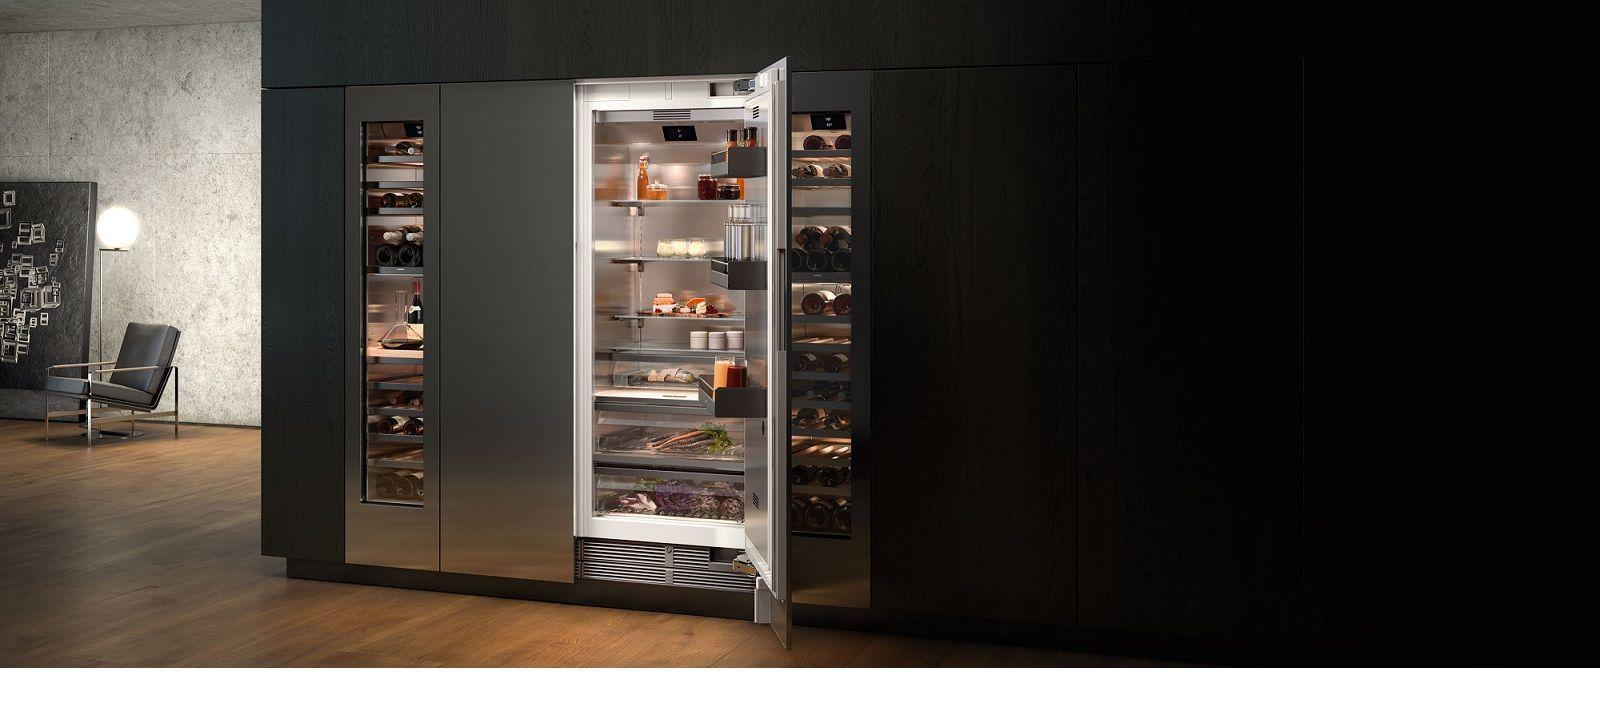 gaggenau vario 400 series refrigerator